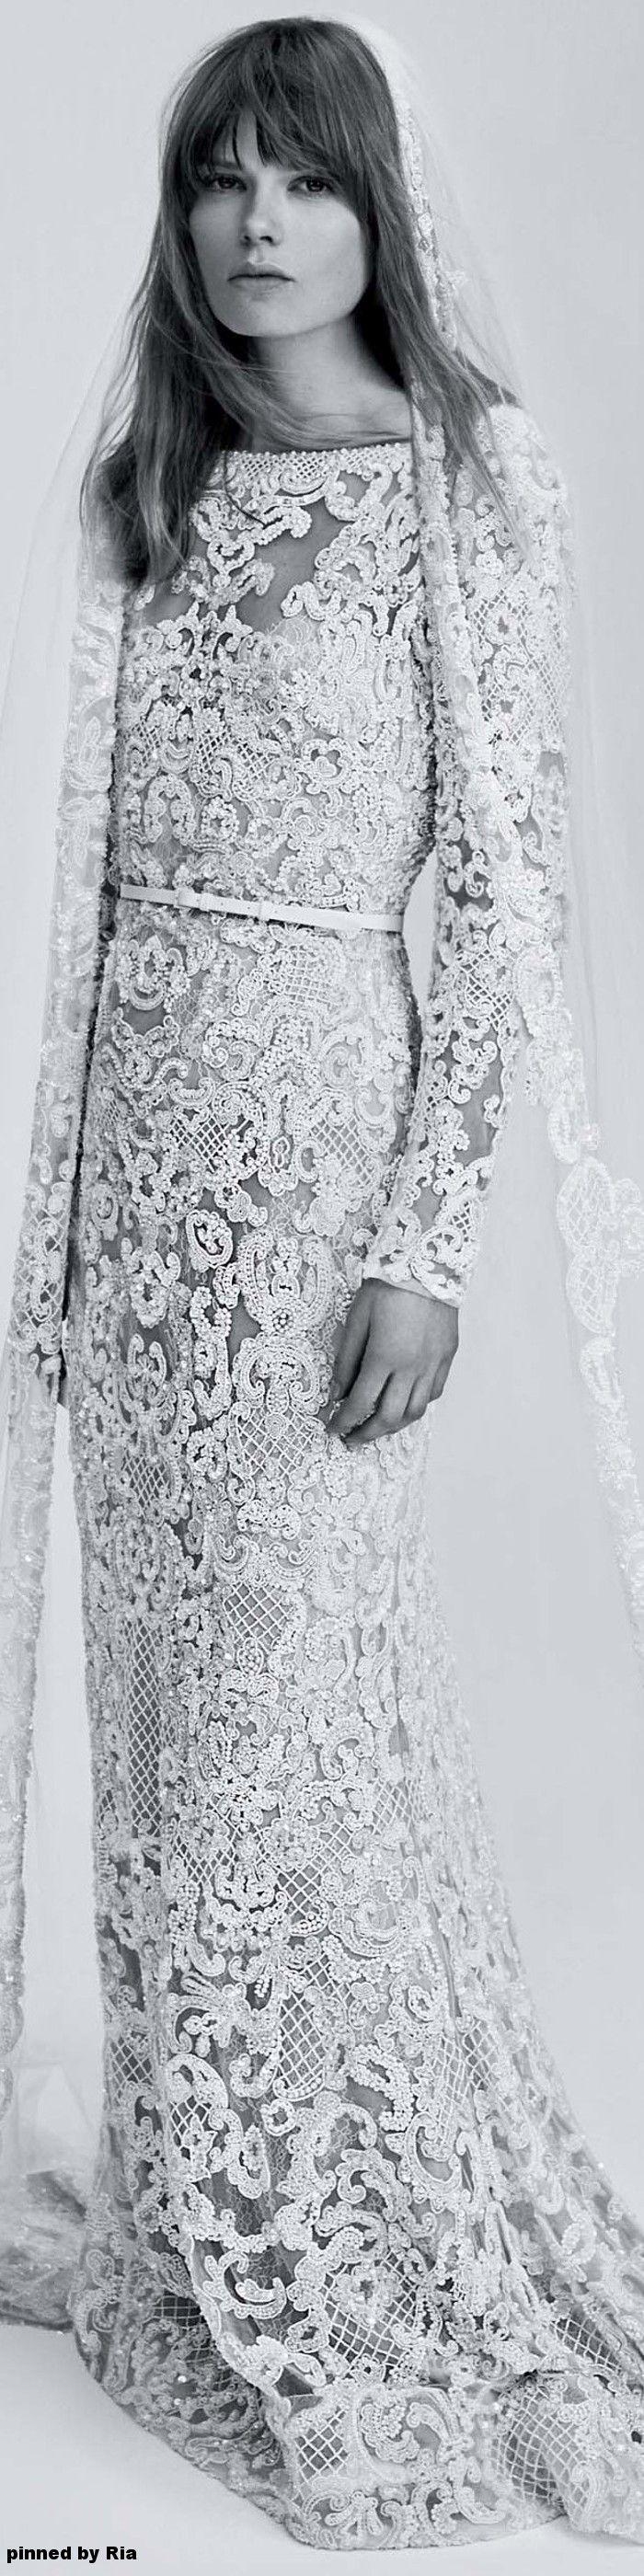 Elie Saab Bridal Spring 2017 l Ria